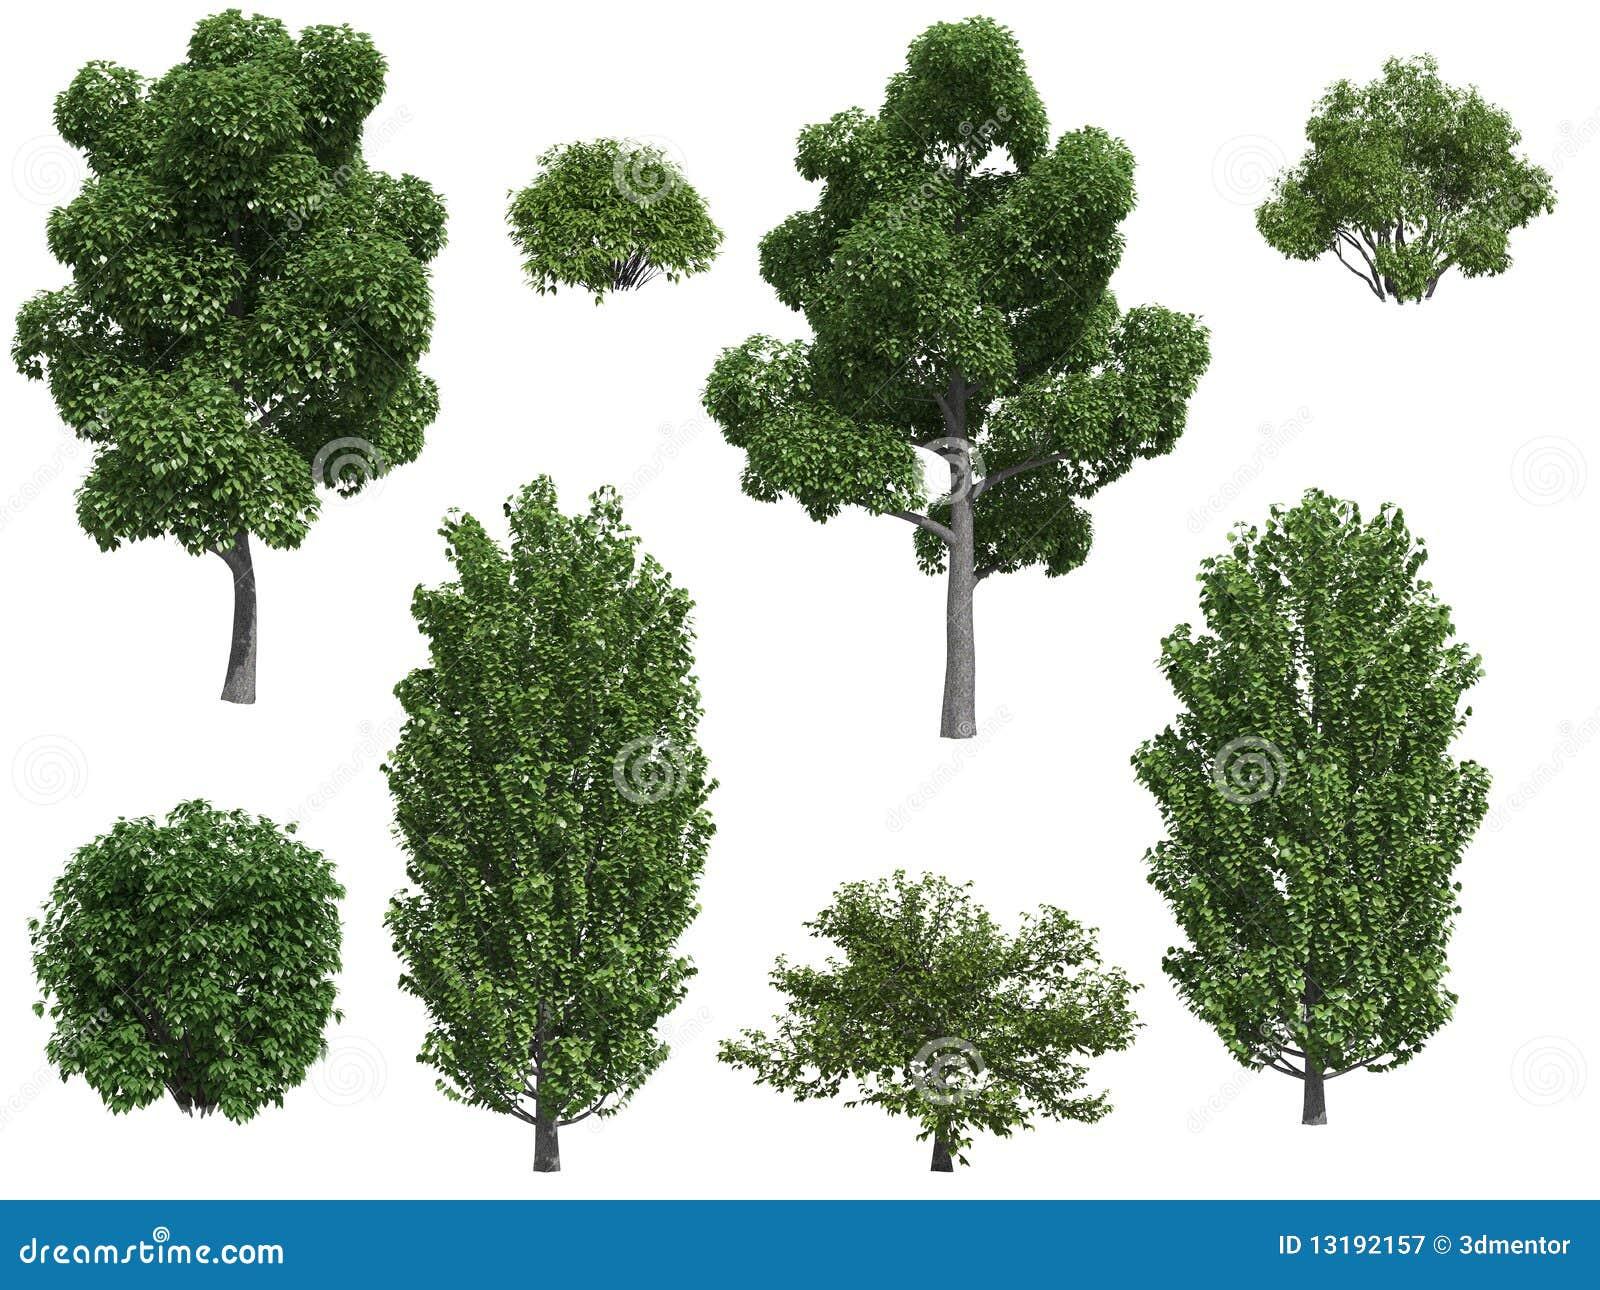 Rboles y arbustos de lamo fotograf a de archivo libre de for Vegetacion ornamental